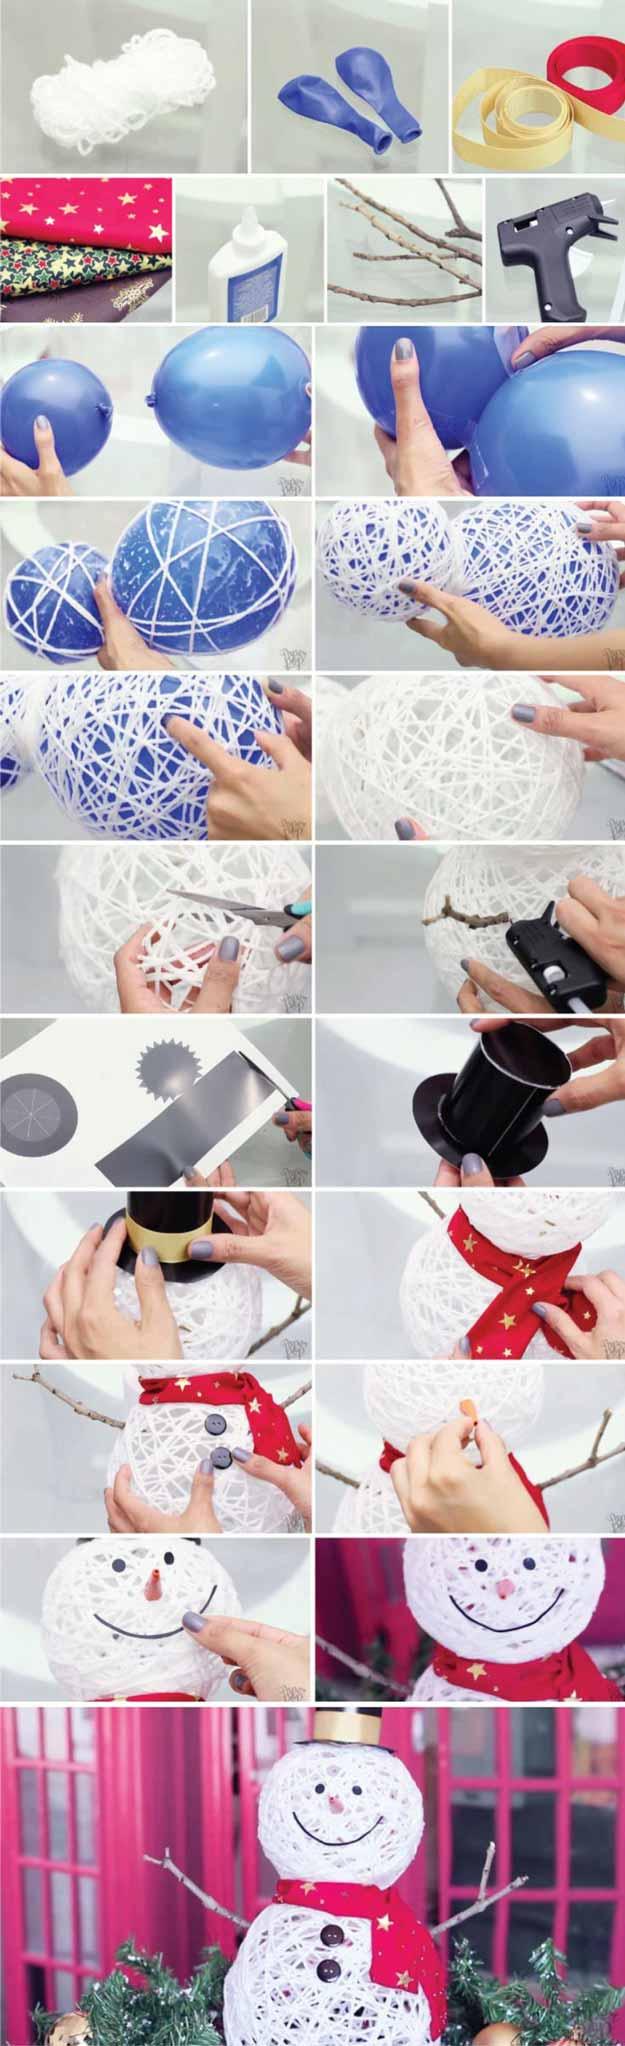 snowman-ideas-for-the-homestead-balloon-string-art-snowman